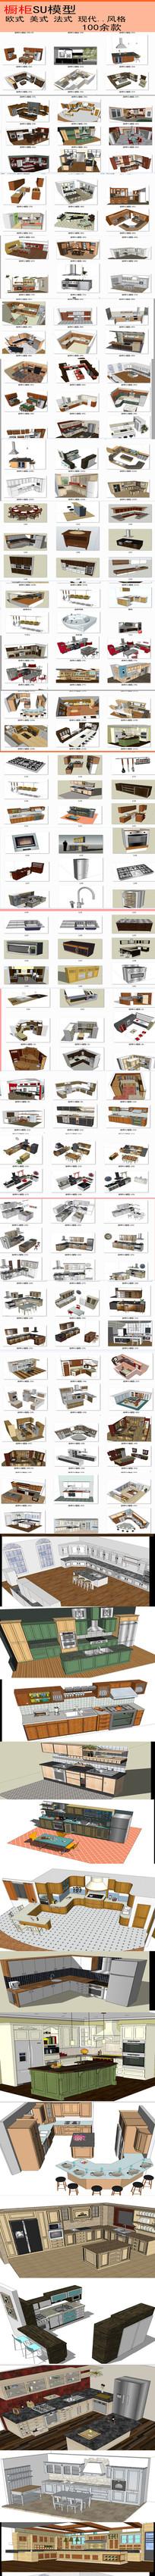 室内橱柜SketchUp 模型